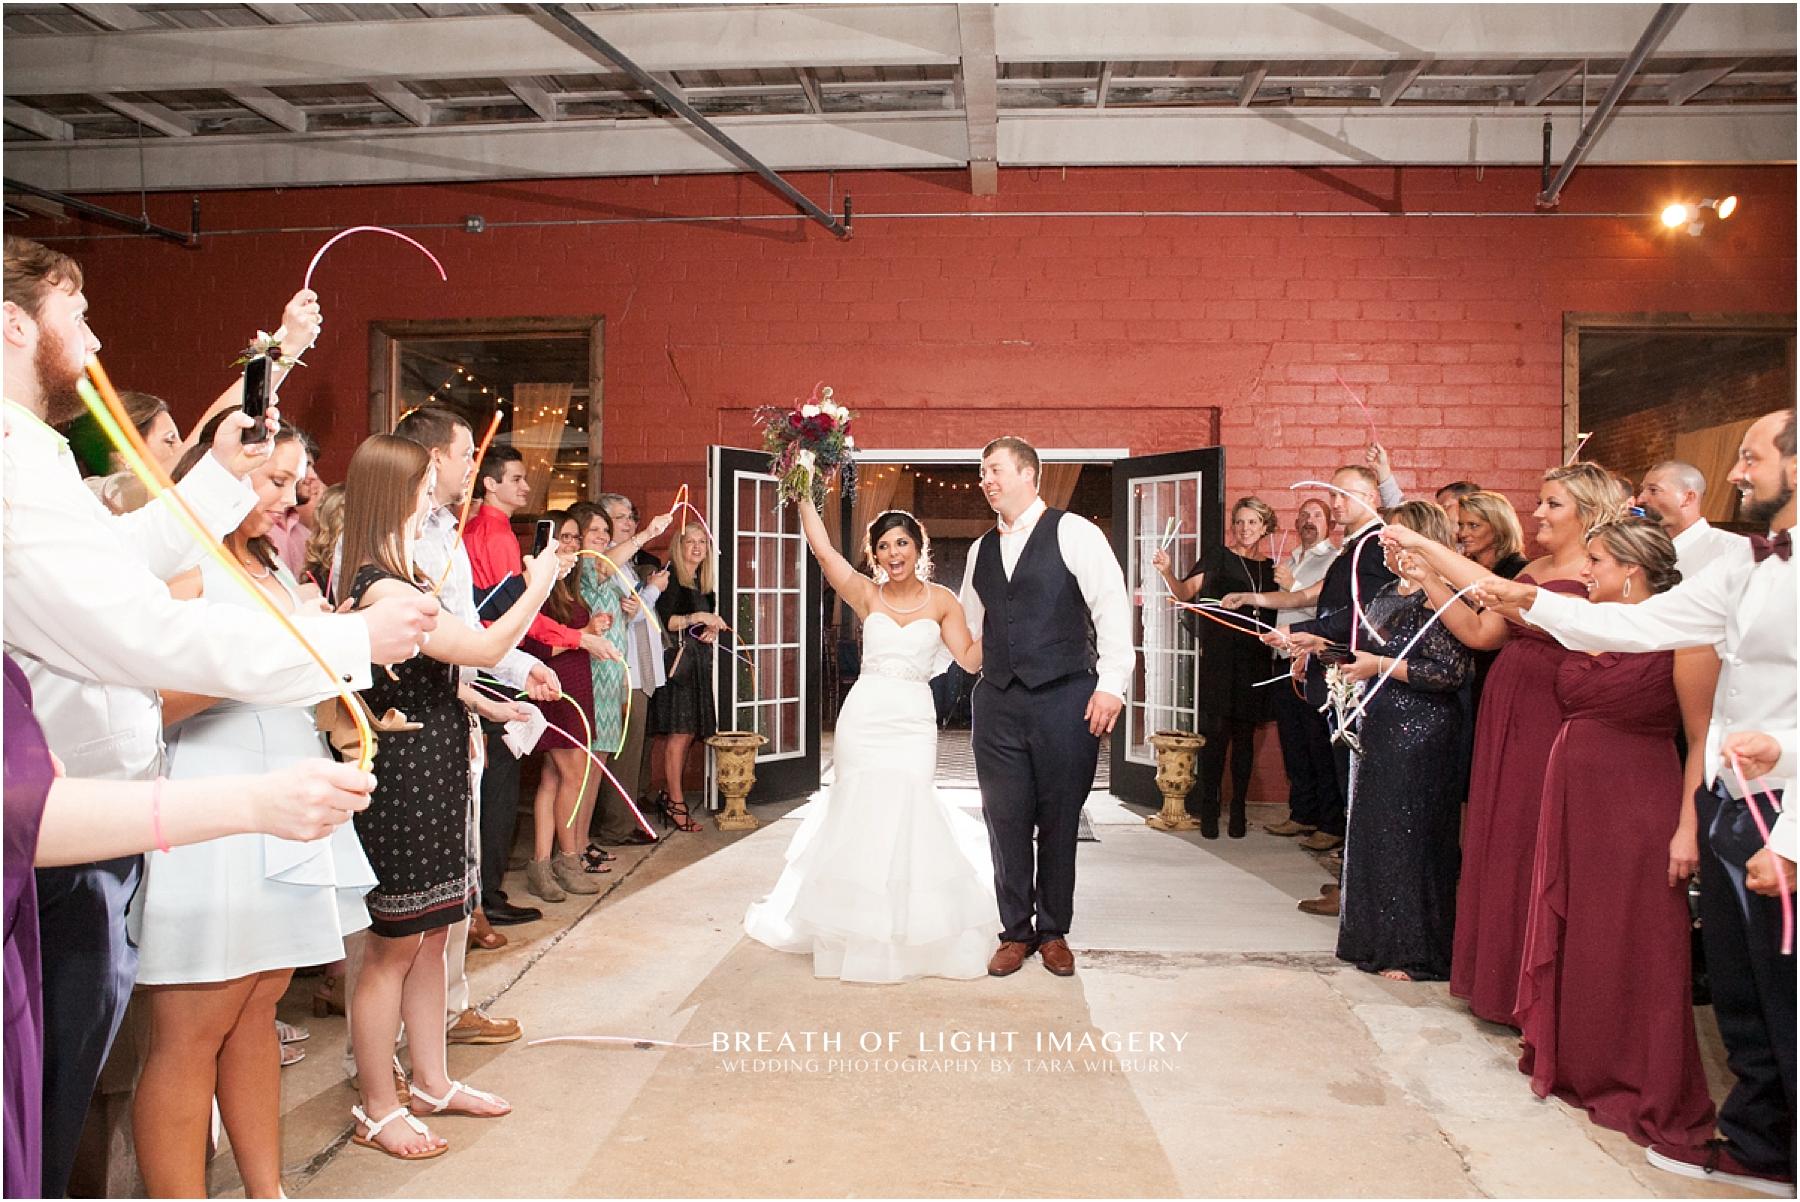 AKIN_wedding_03182017-699.jpg